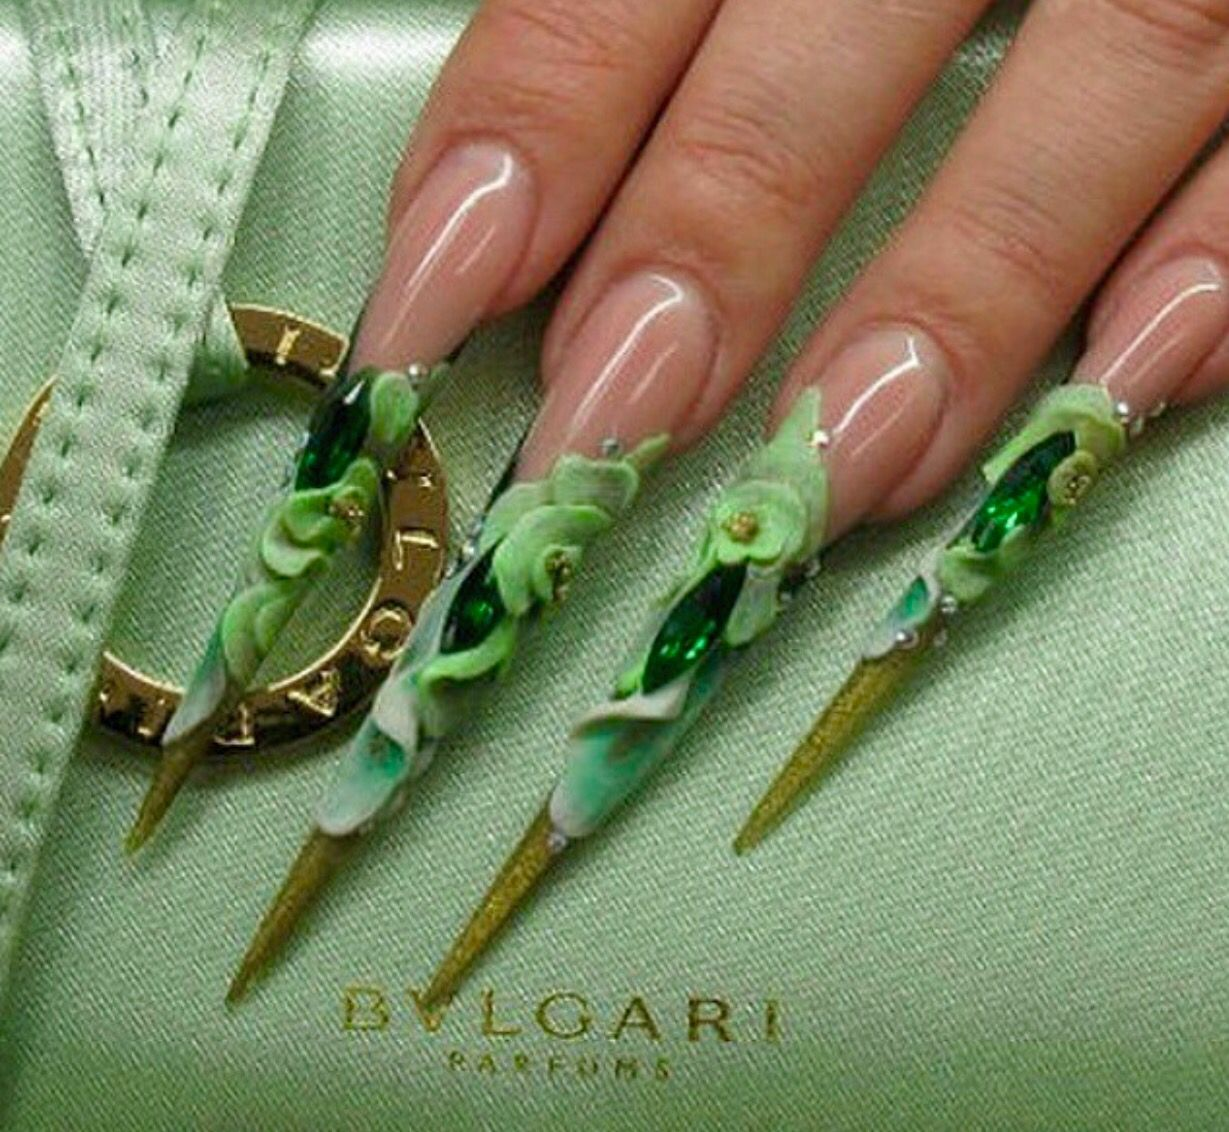 Pin by janette mg on decoracion de uñas pinterest gorgeous nails